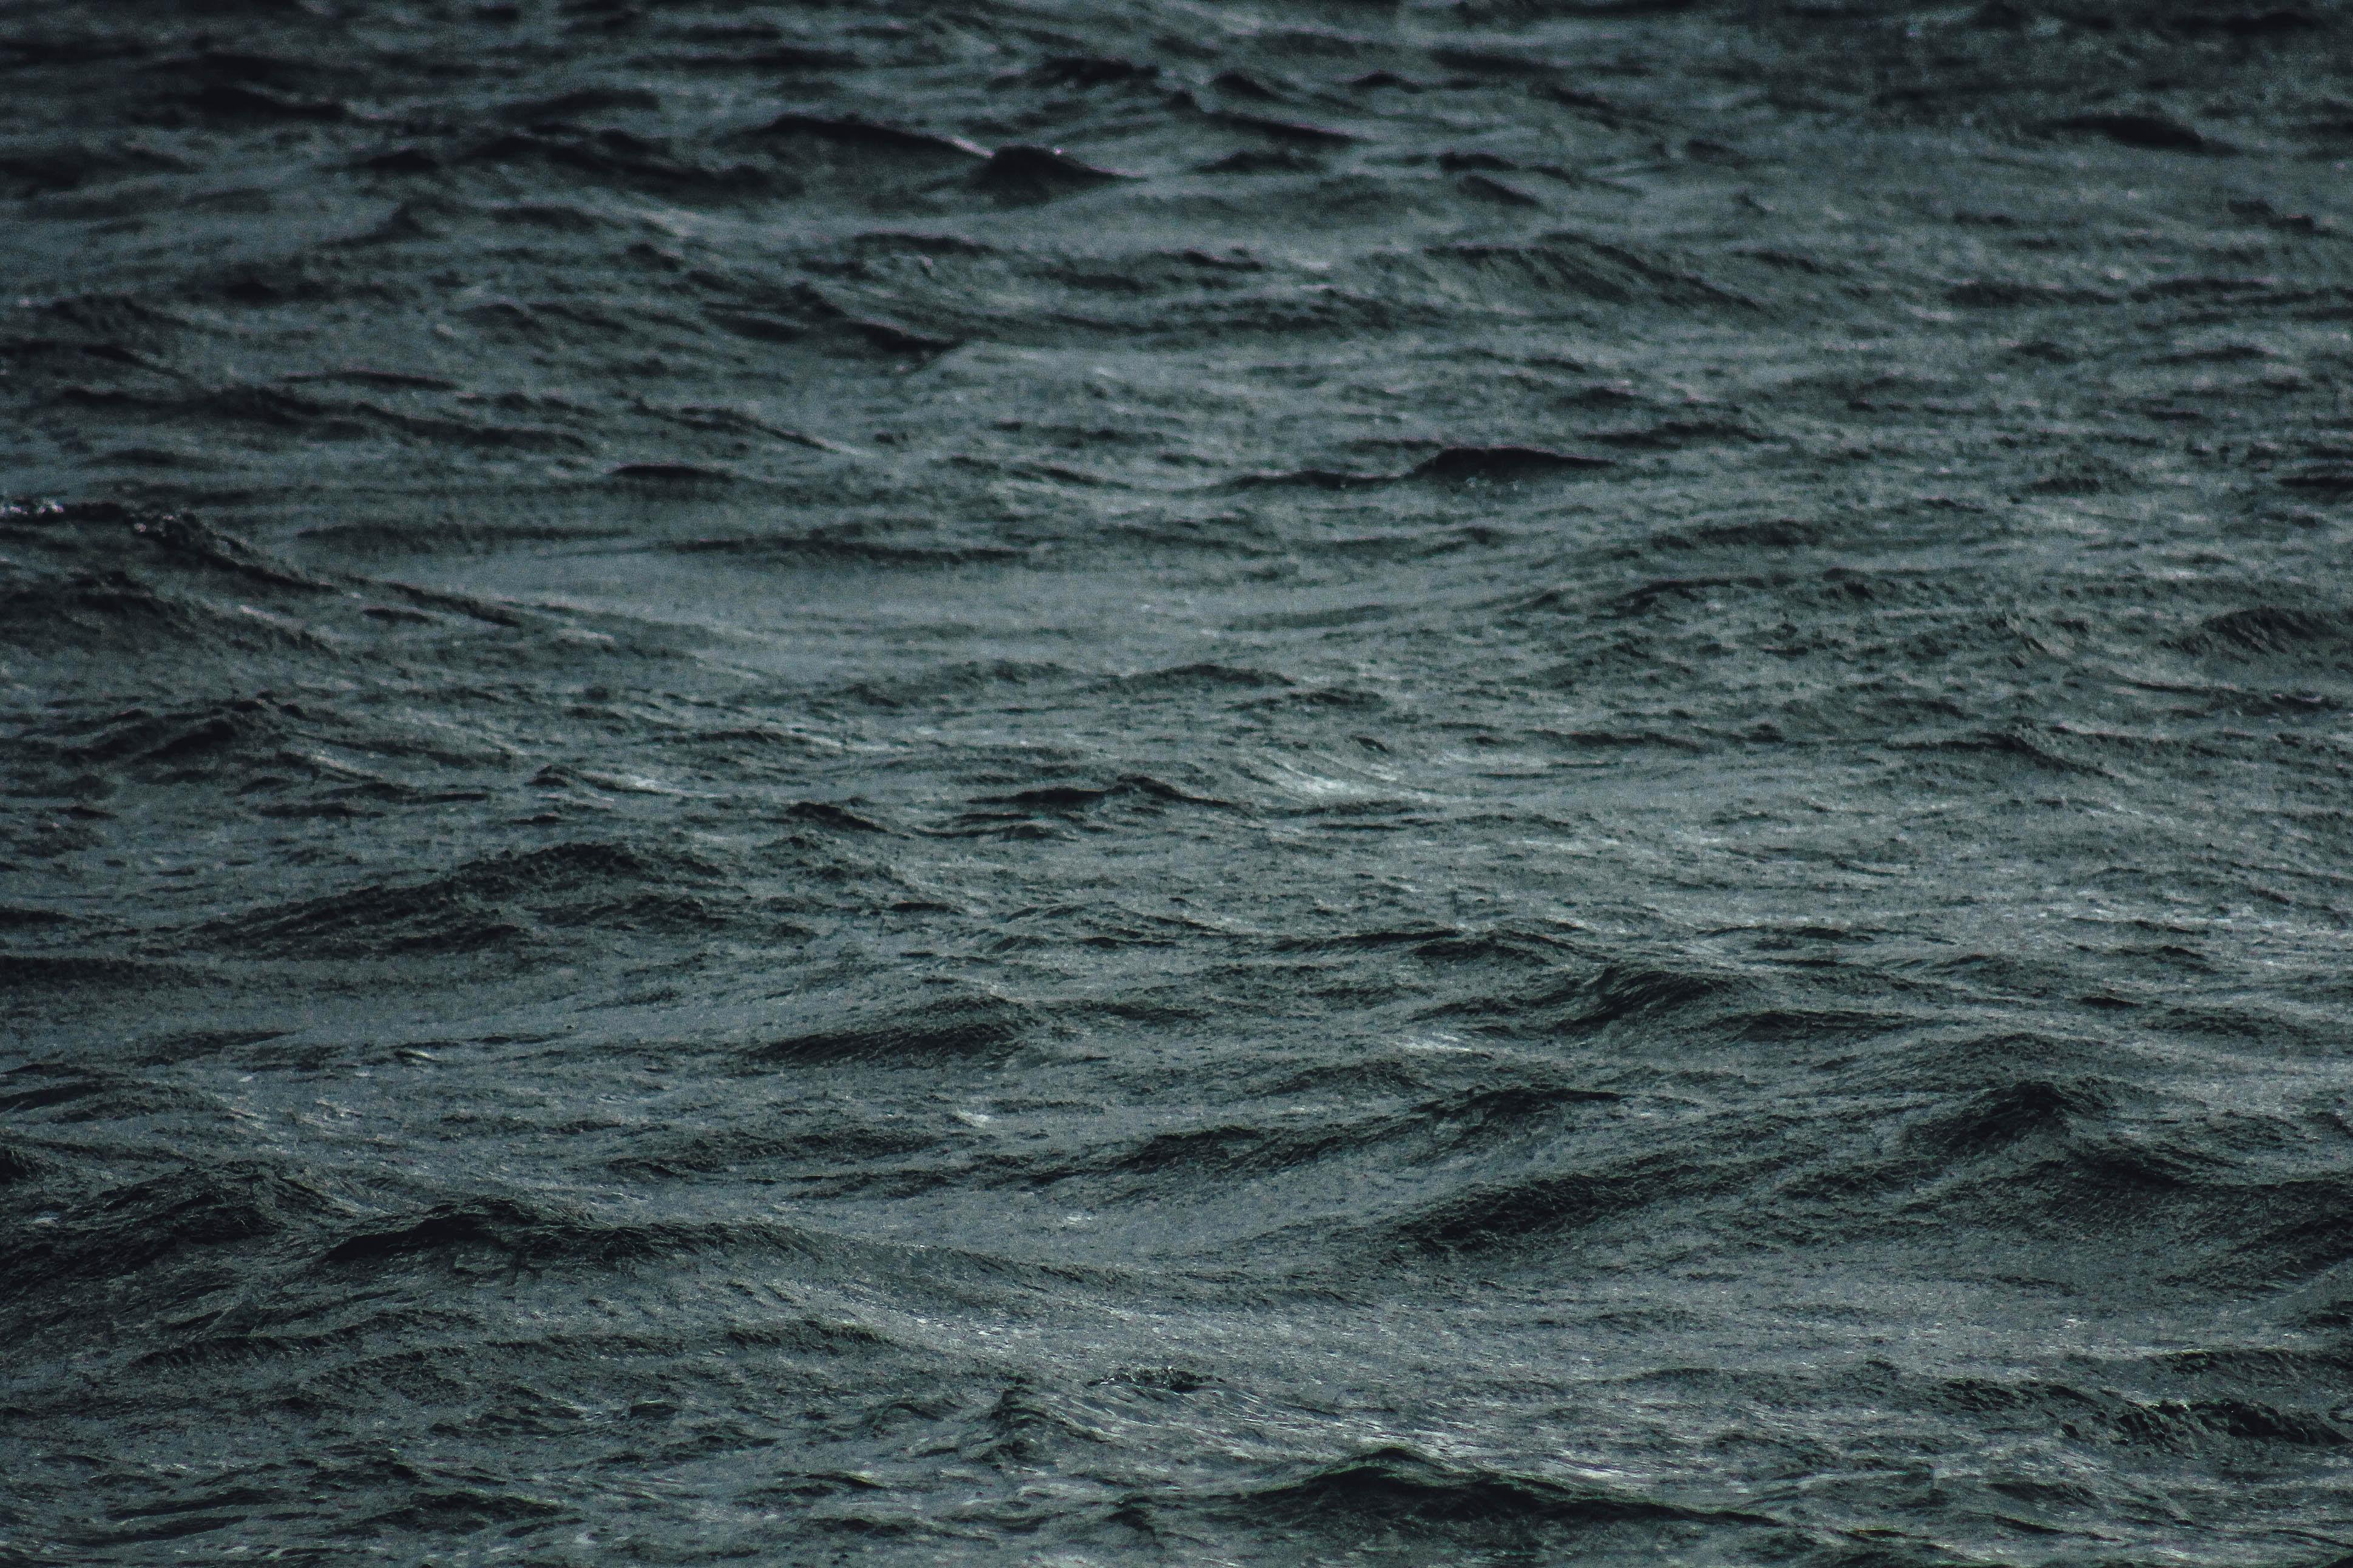 gray body of water